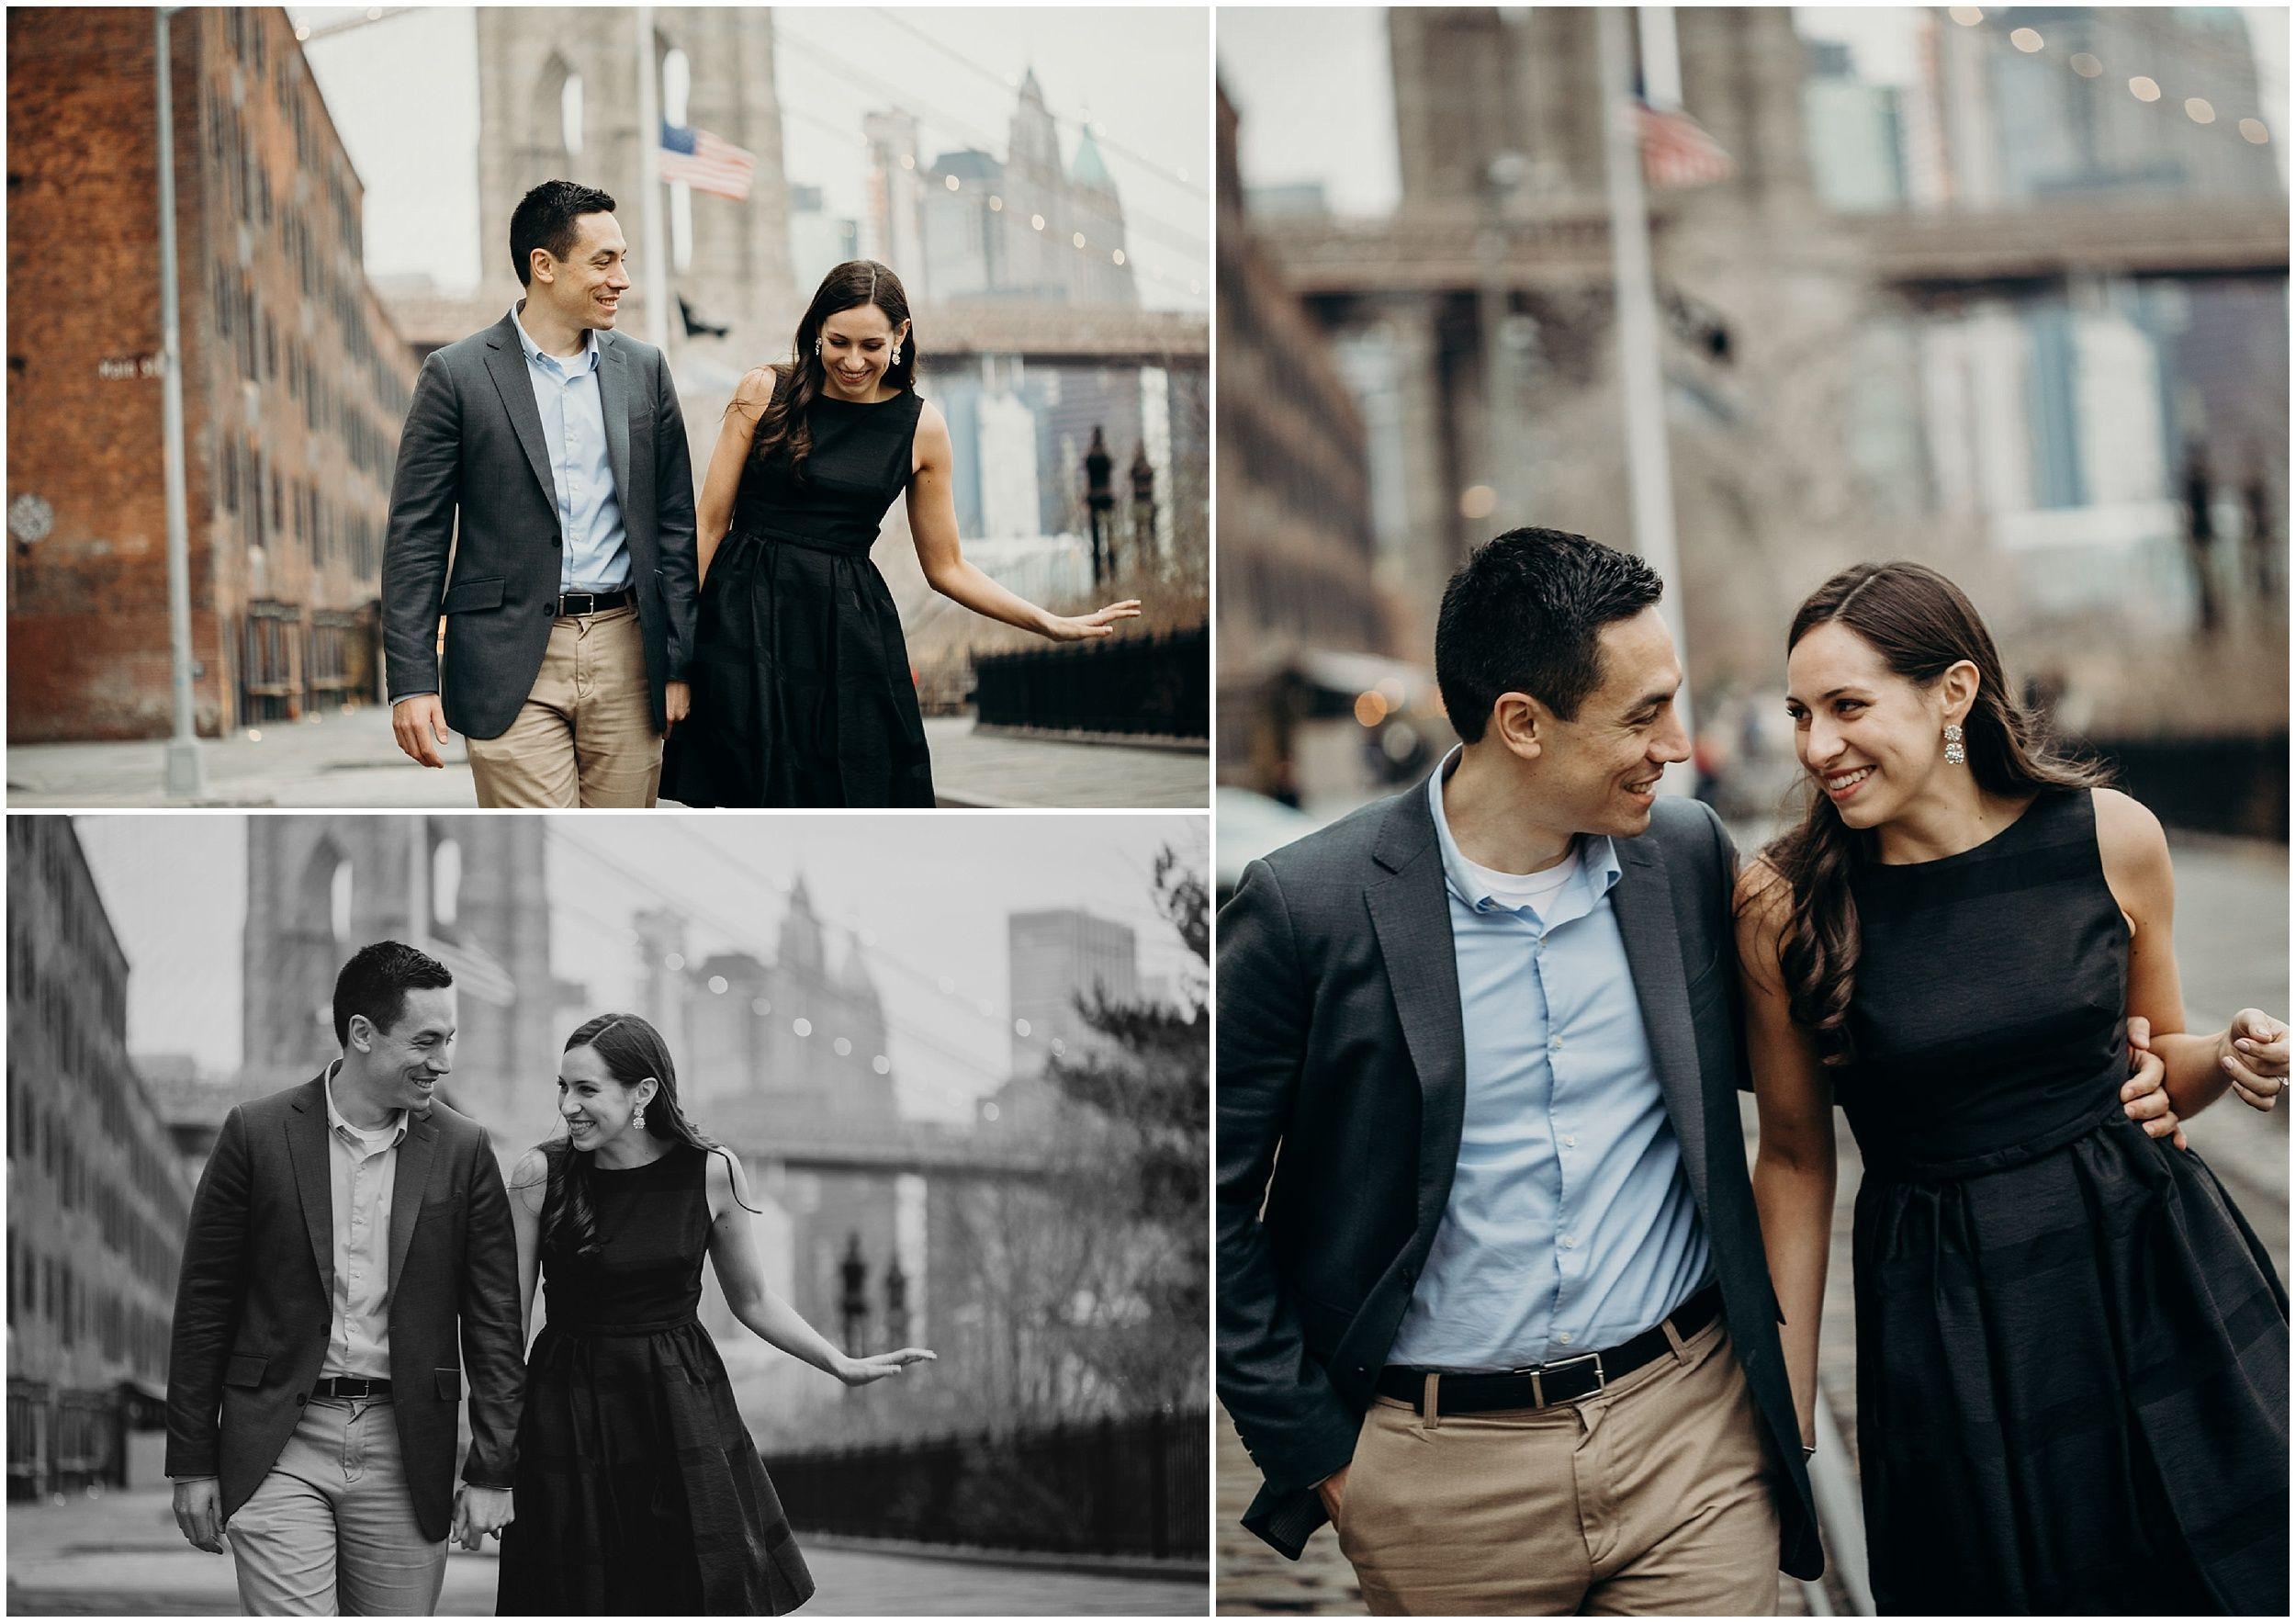 tara  chris  dumbo brooklyn engagement session  lauren spinelli photography   tara  chris  dumbo brooklyn engagement session  lauren spinelli photography  urenspin